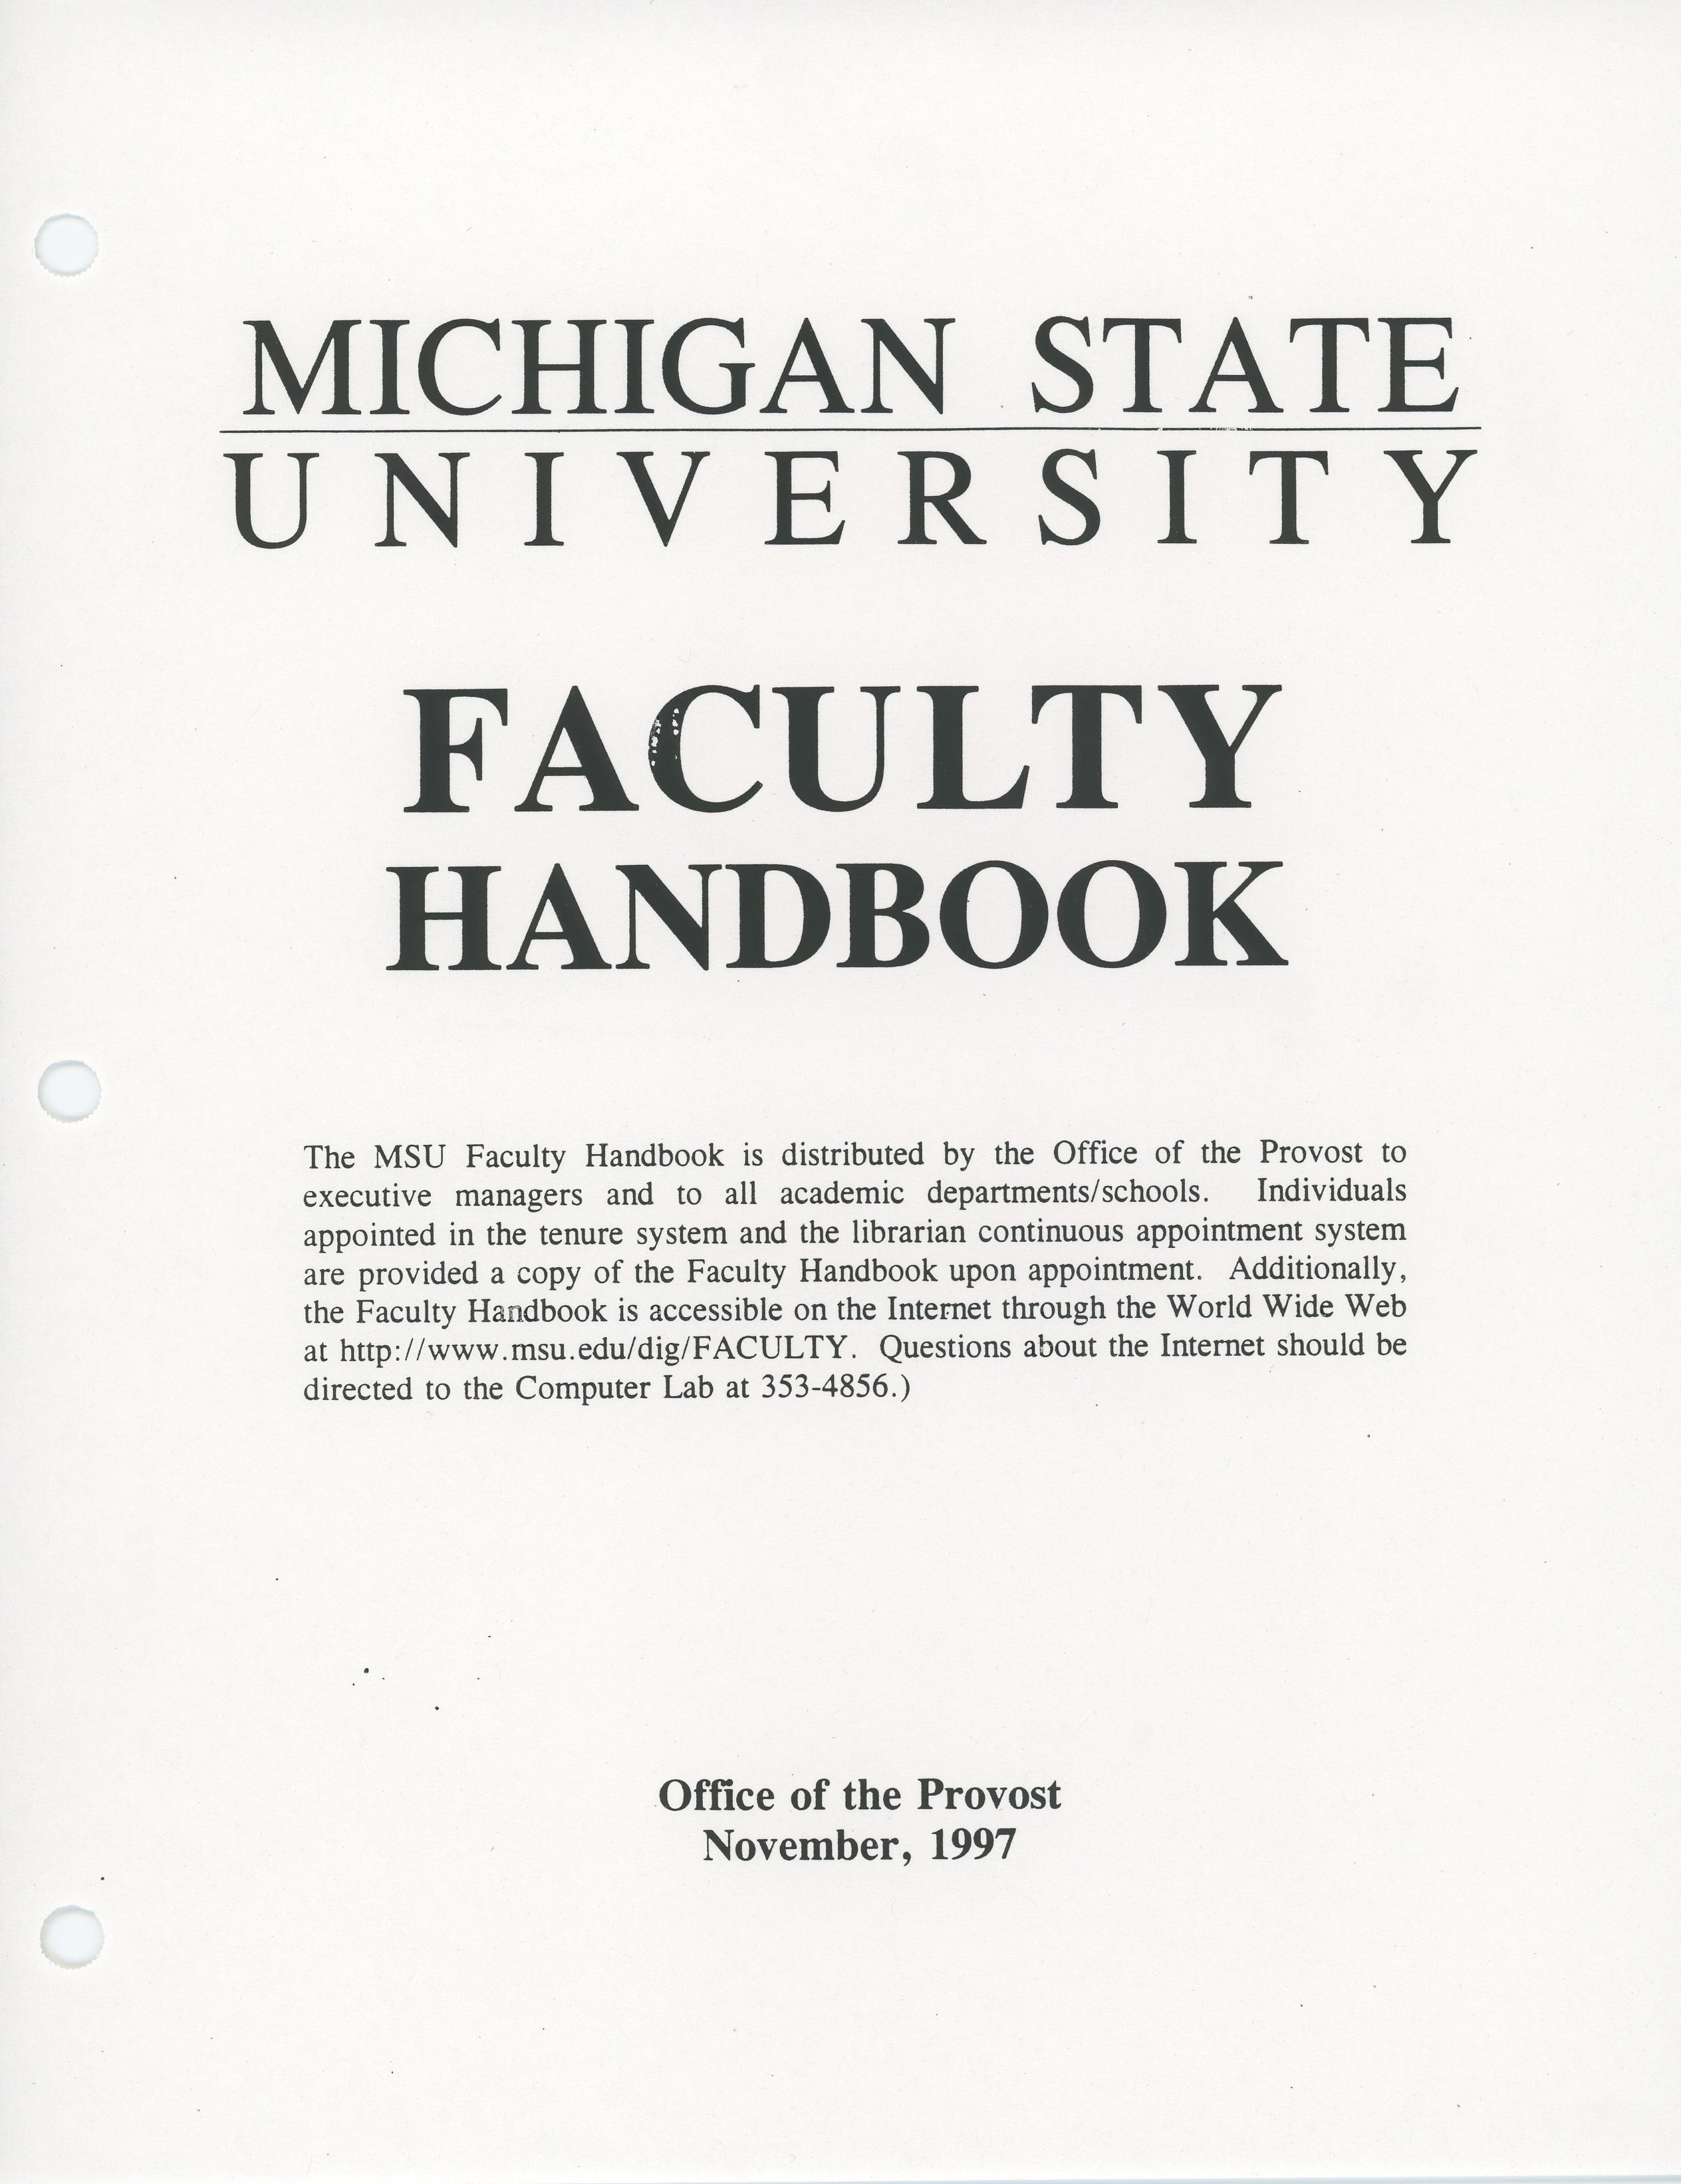 Faculty Handbook, 1997